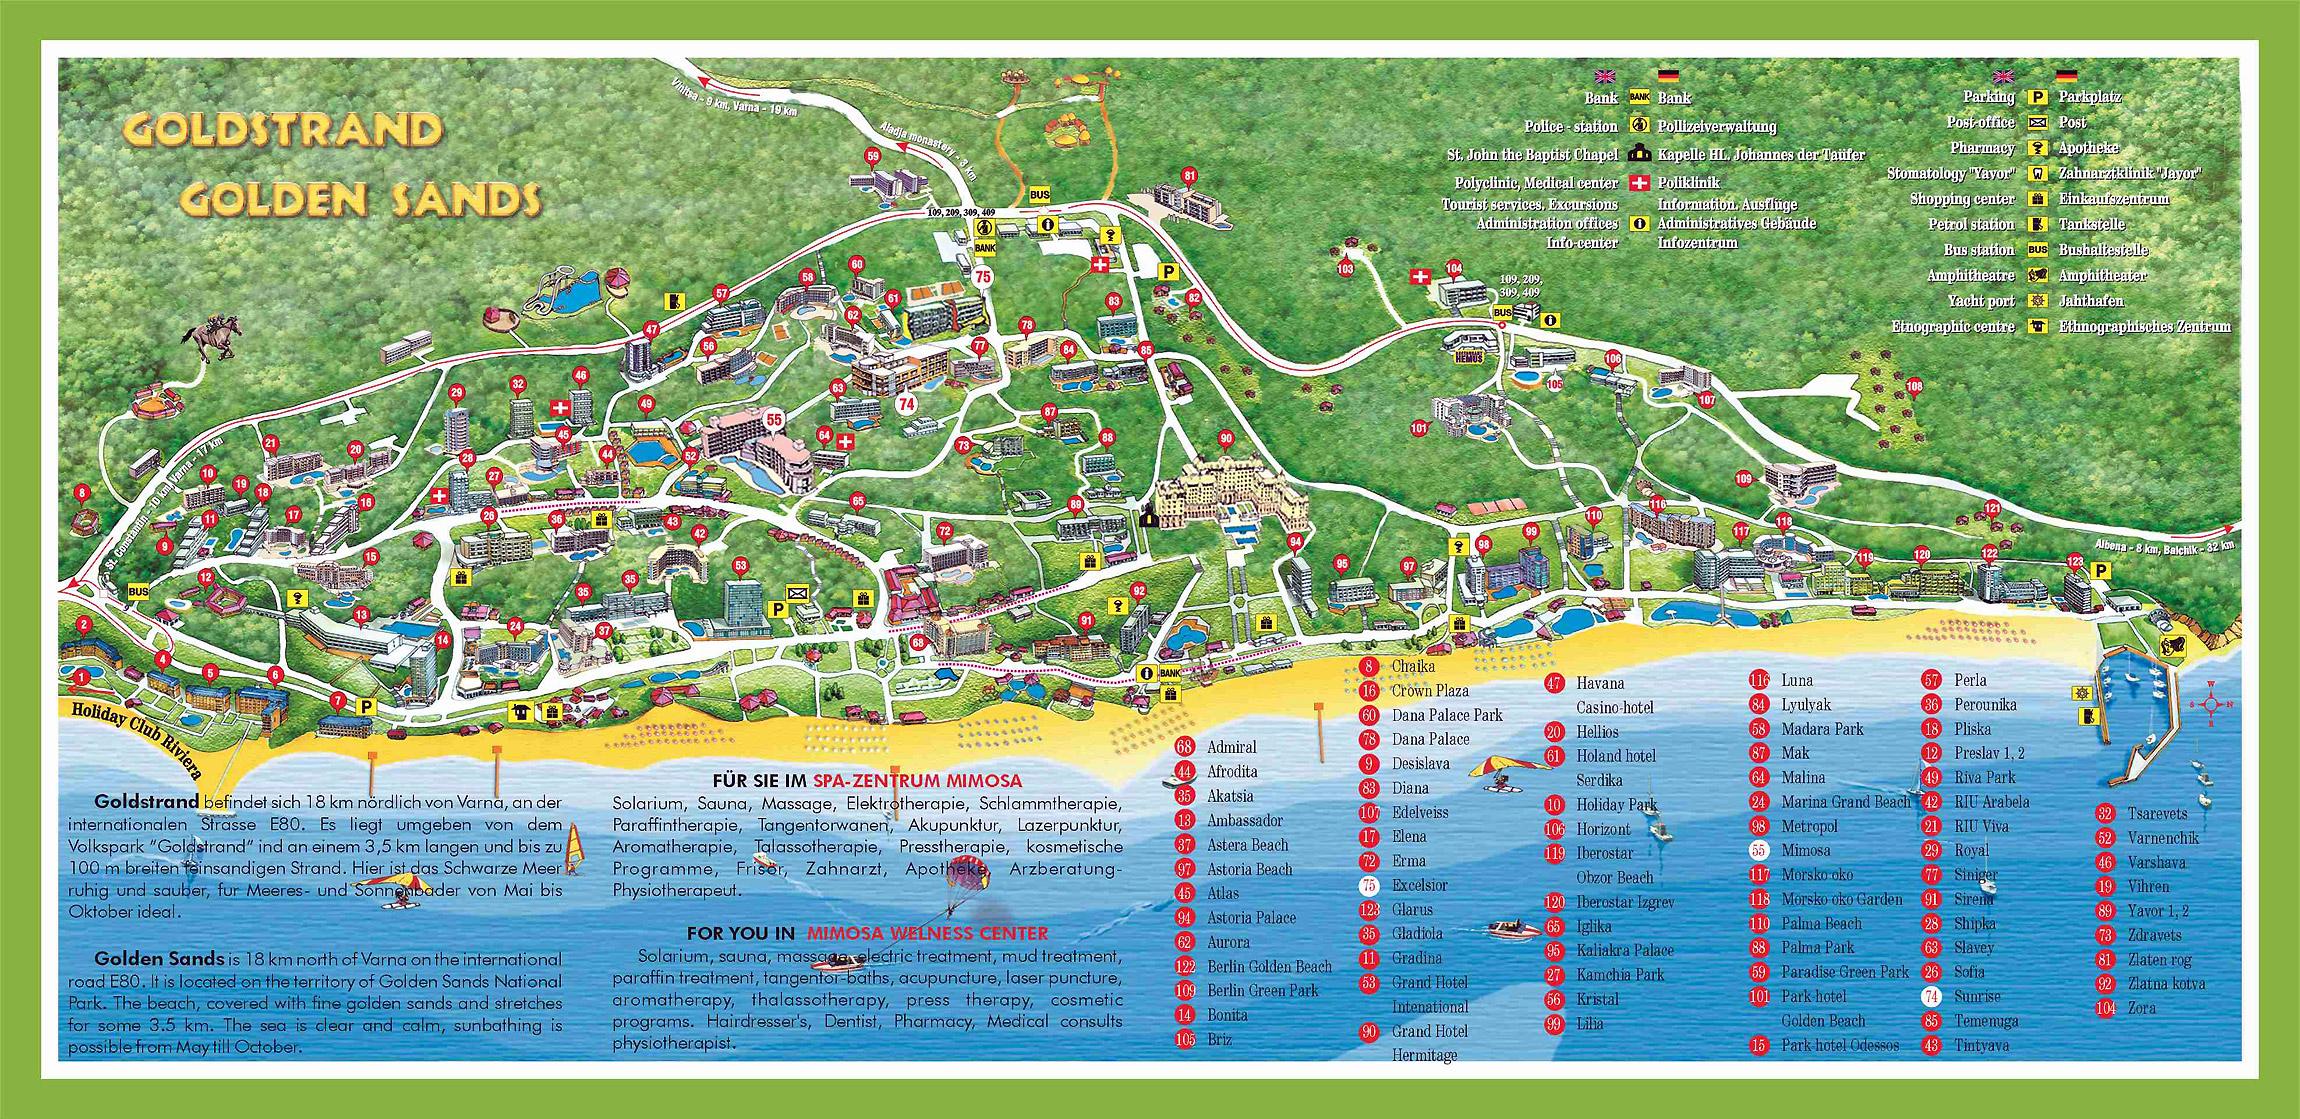 Golden Sands Varna Tourist Map Varna Mappery - Varna map